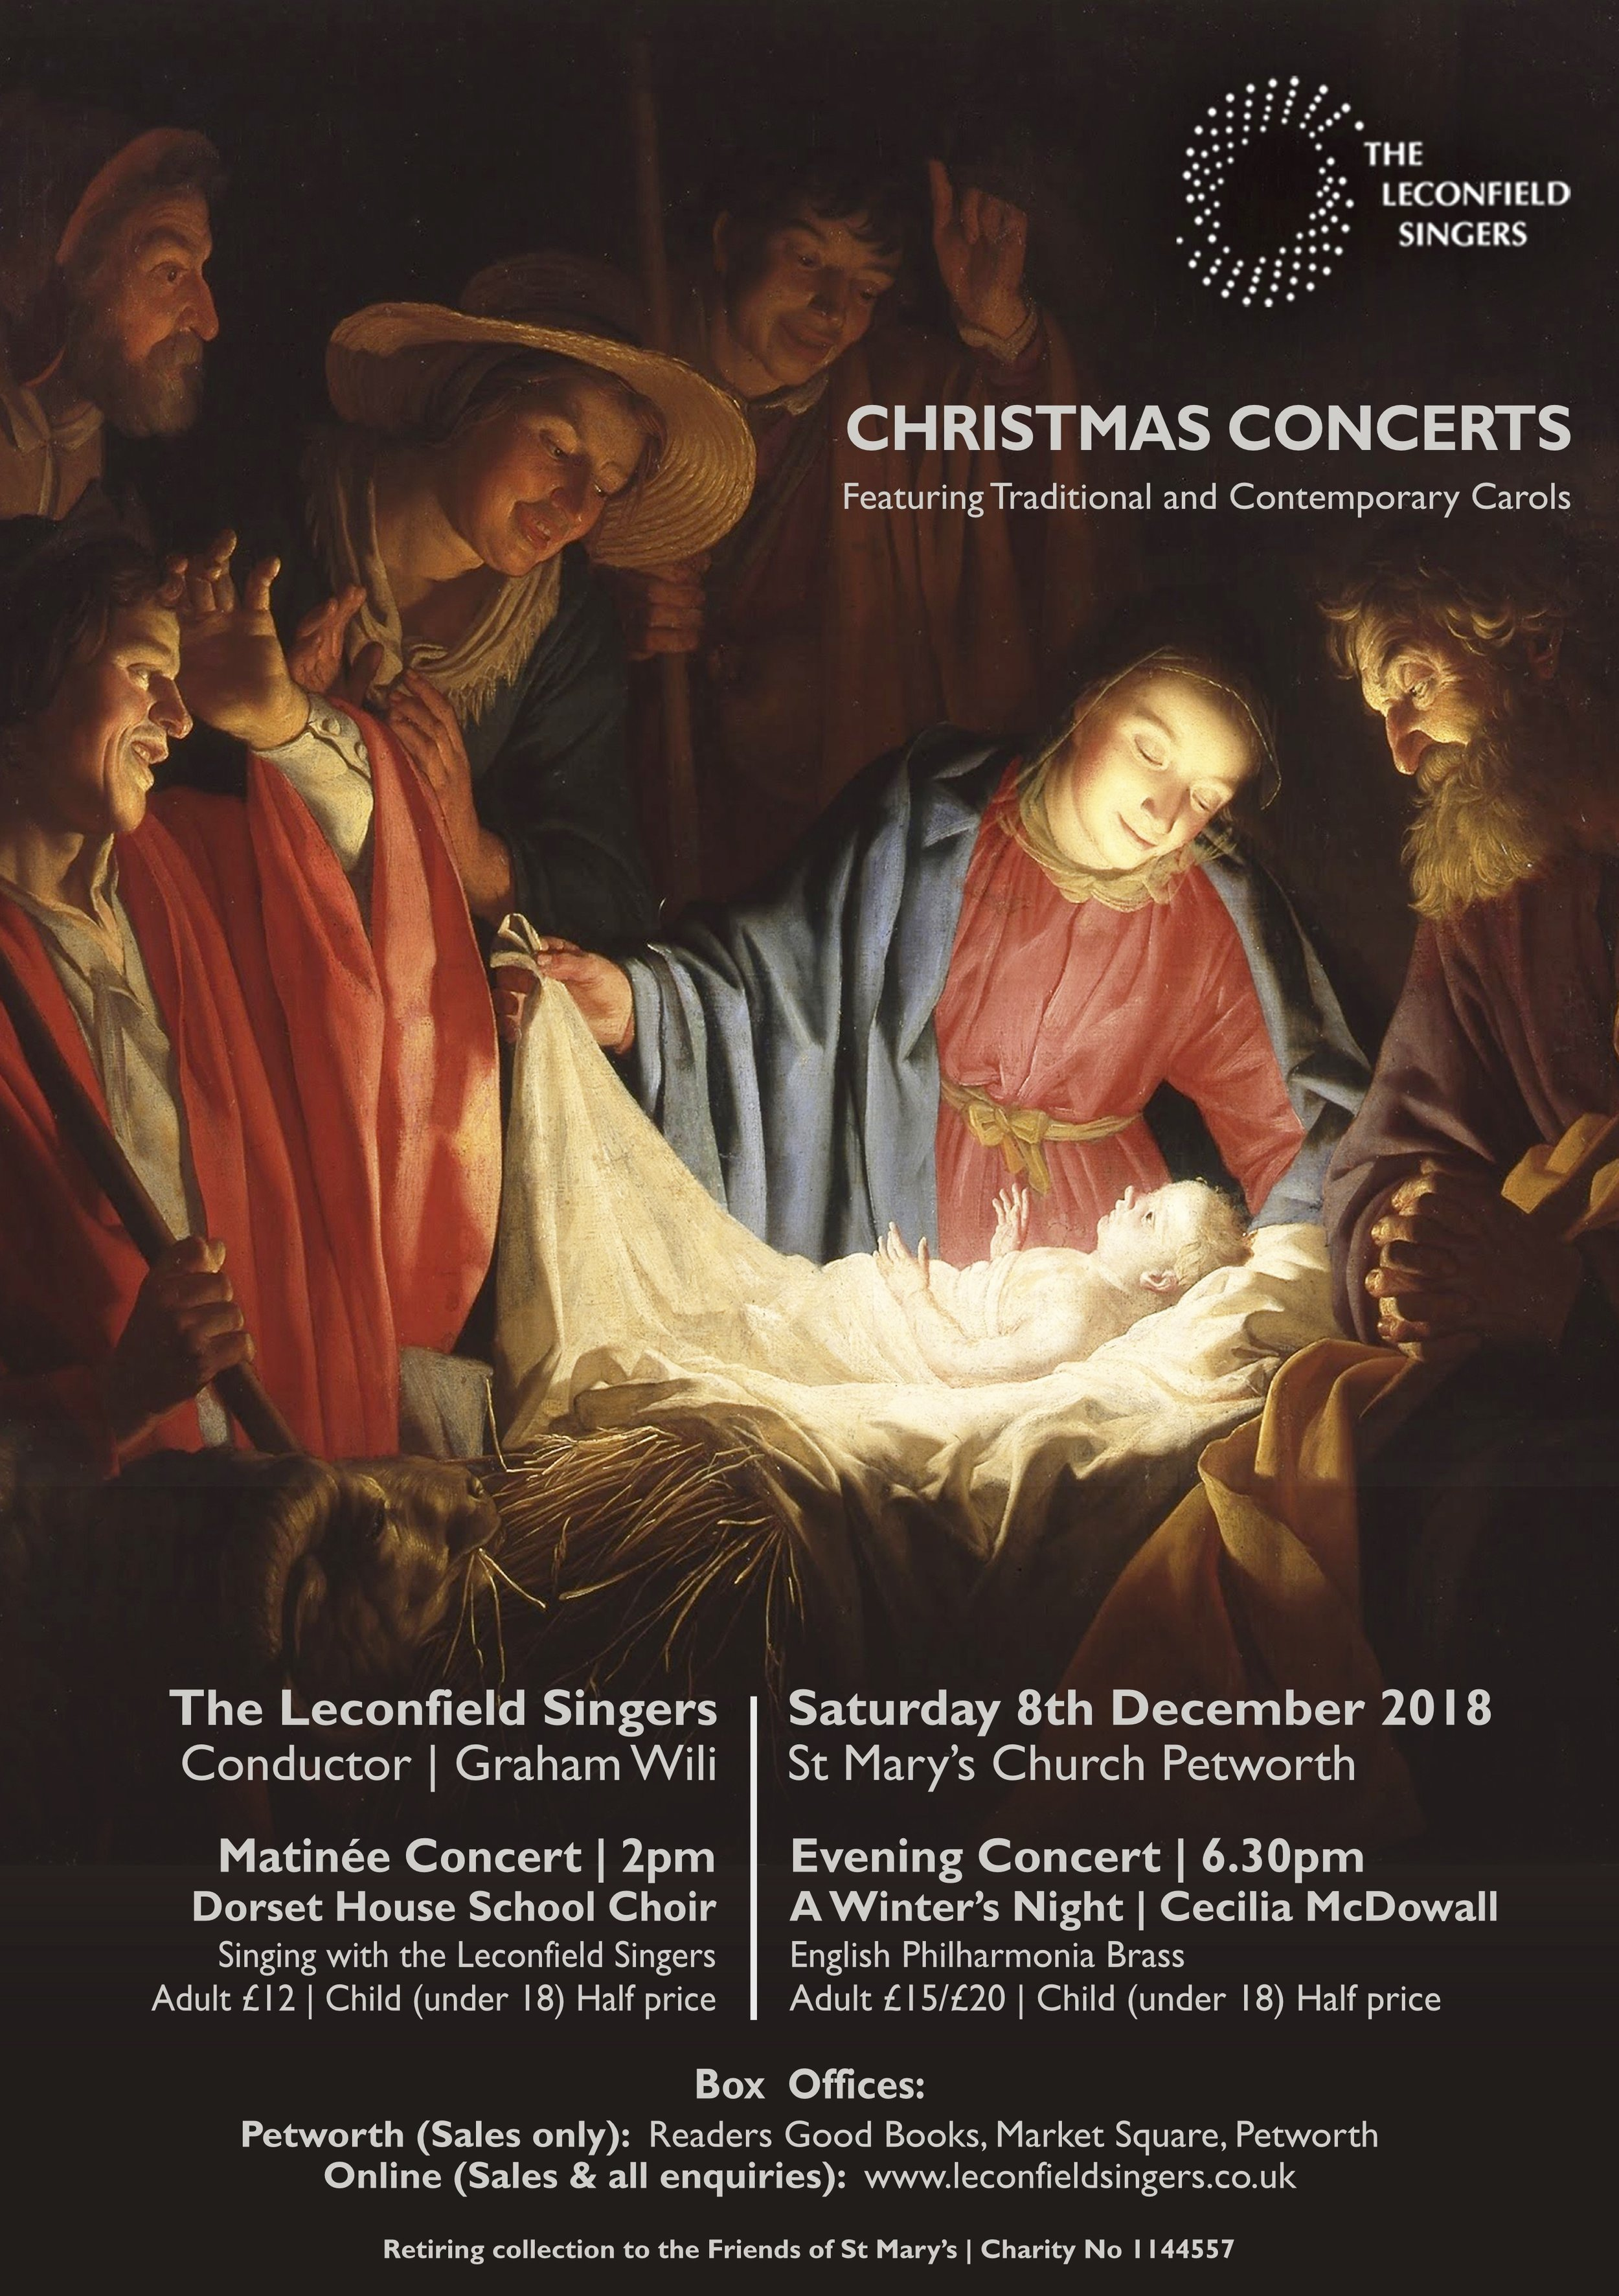 The Leconfield Singers Christmas Concert